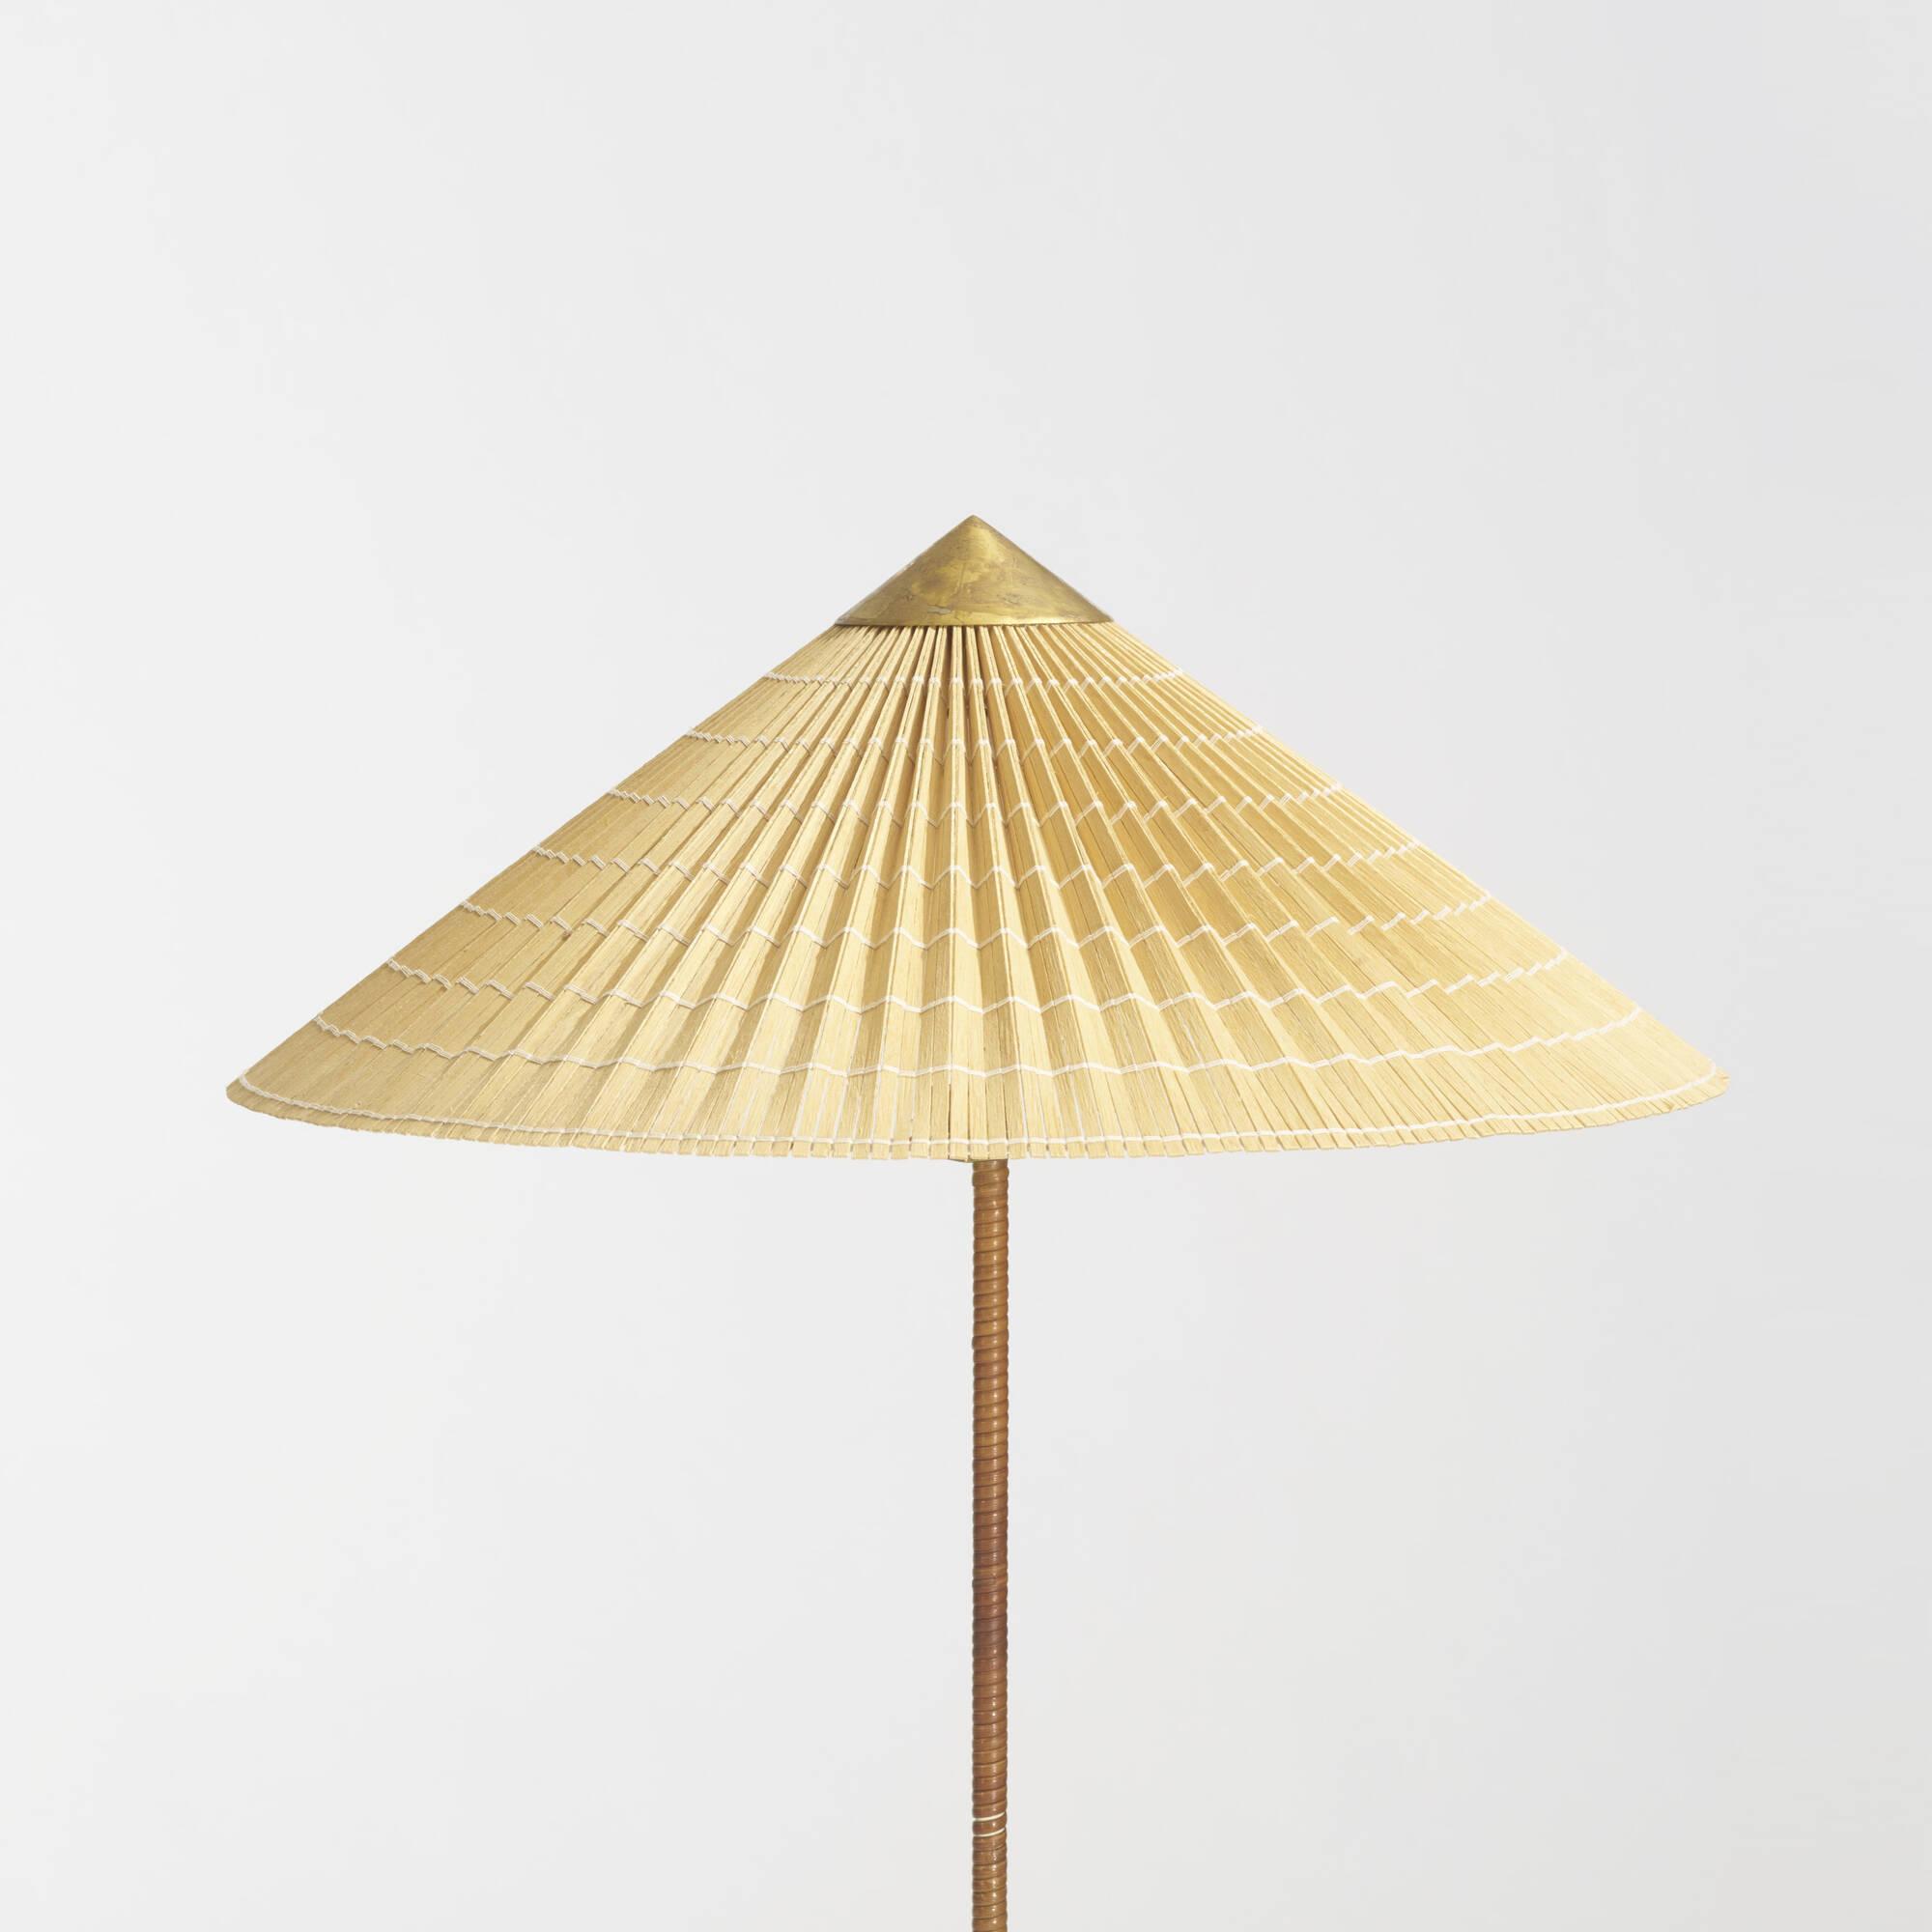 193: Paavo Tynell / floor lamp (2 of 2)